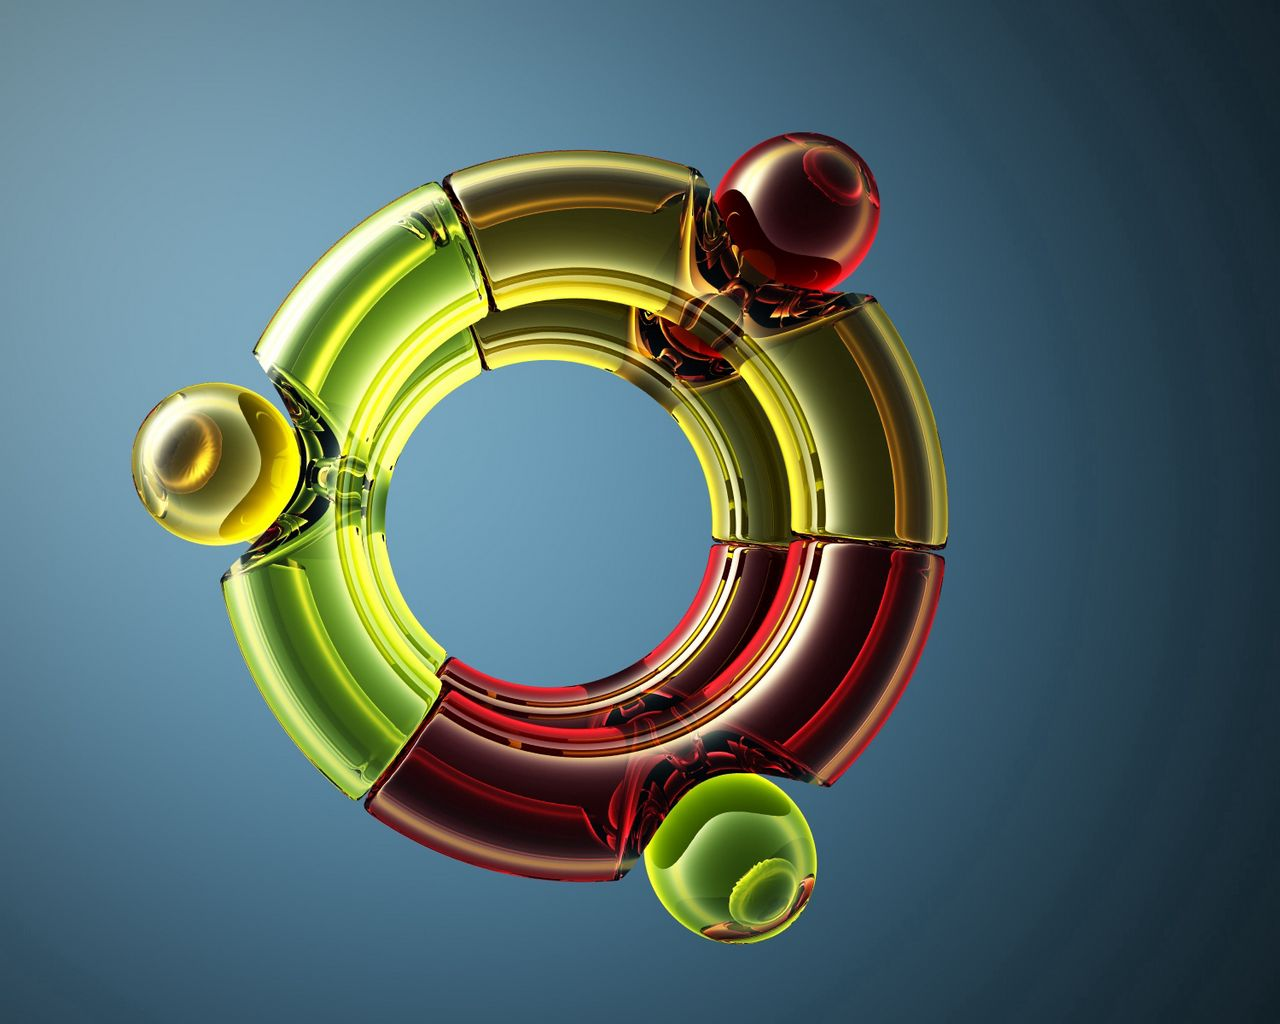 1280x1024 Wallpaper ubuntu, system, multi-colored, space